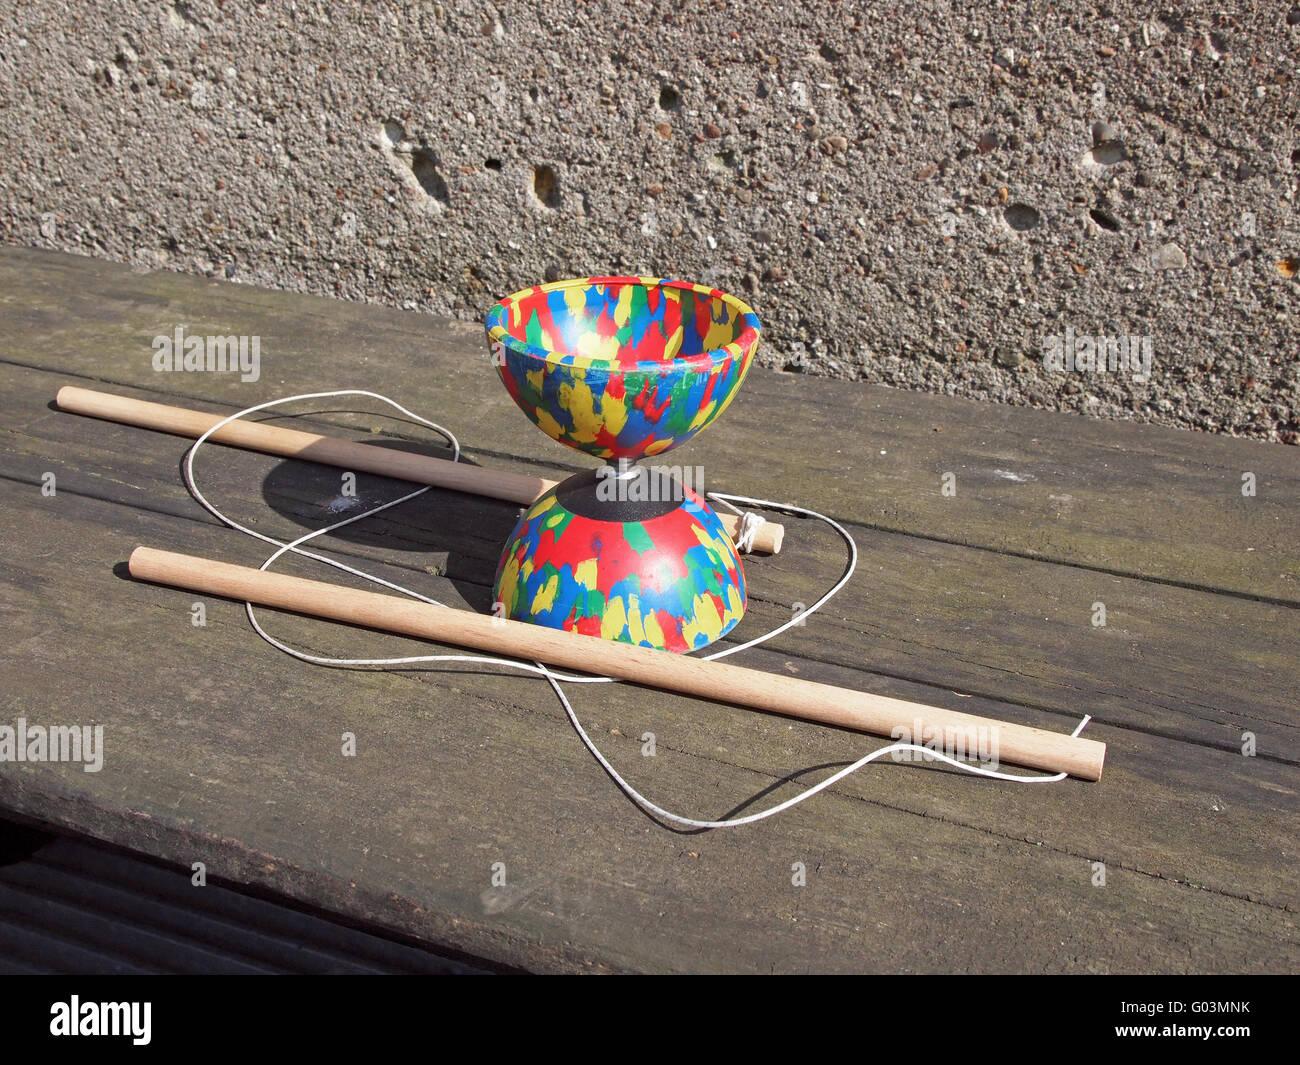 juggling - Stock Image